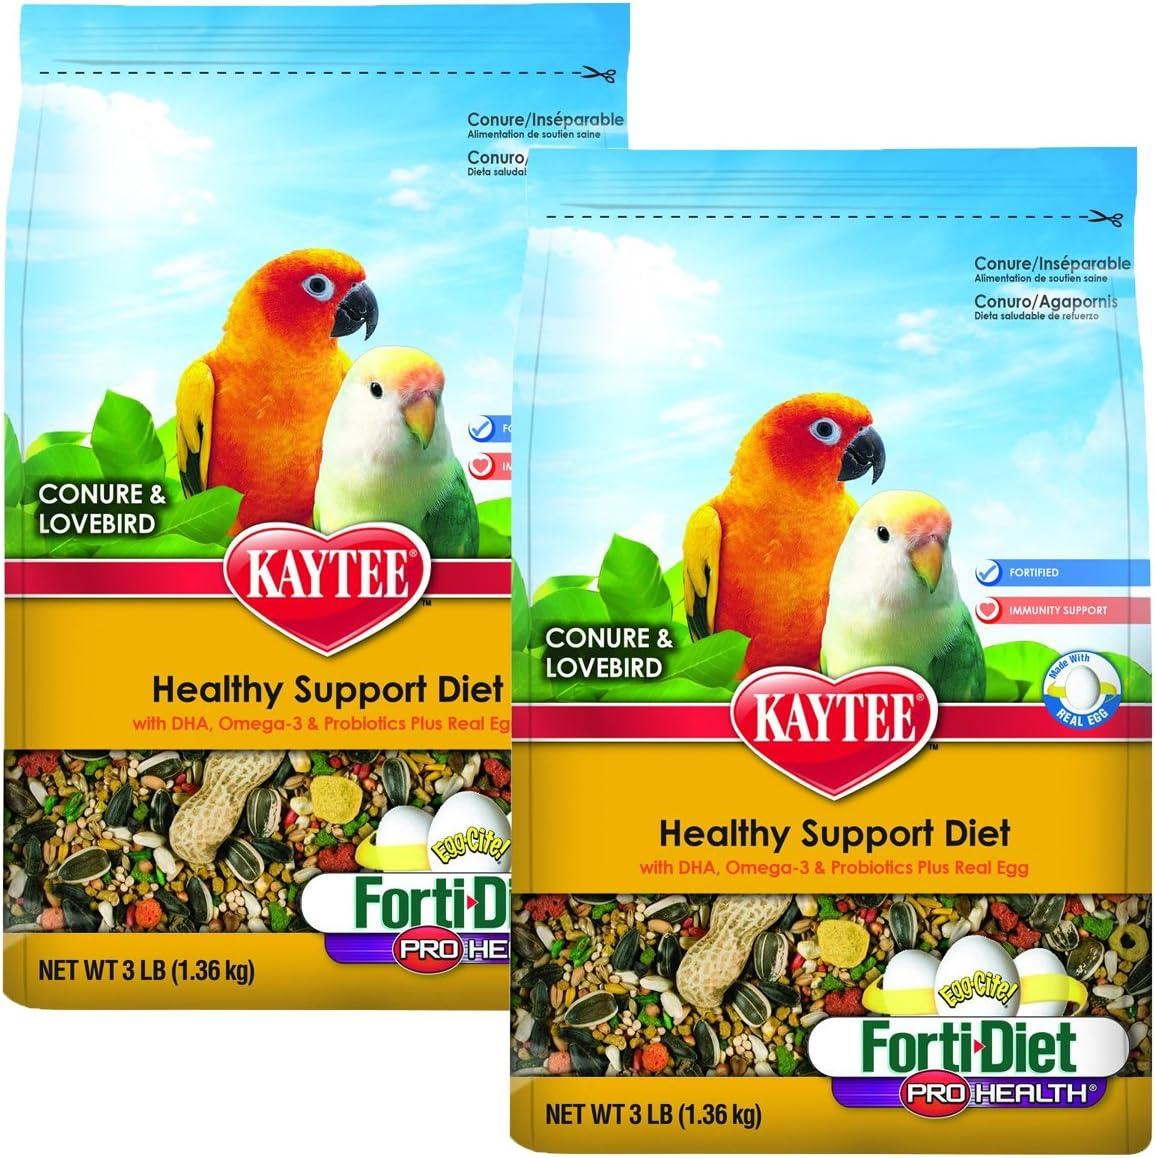 Kaytee Forti-Diet Pro Health Egg-Cite! Conure & Lovebird Food, 2 pack 3-lb bags